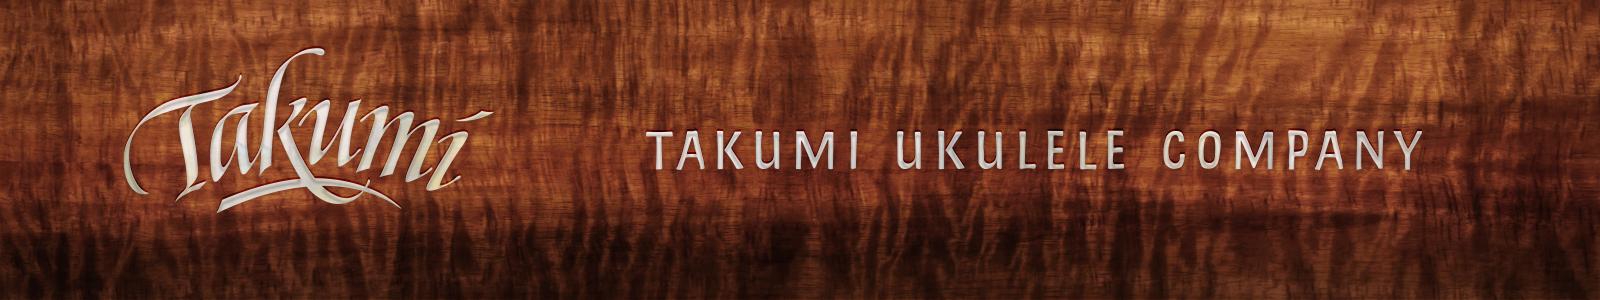 Takumi Ukulele